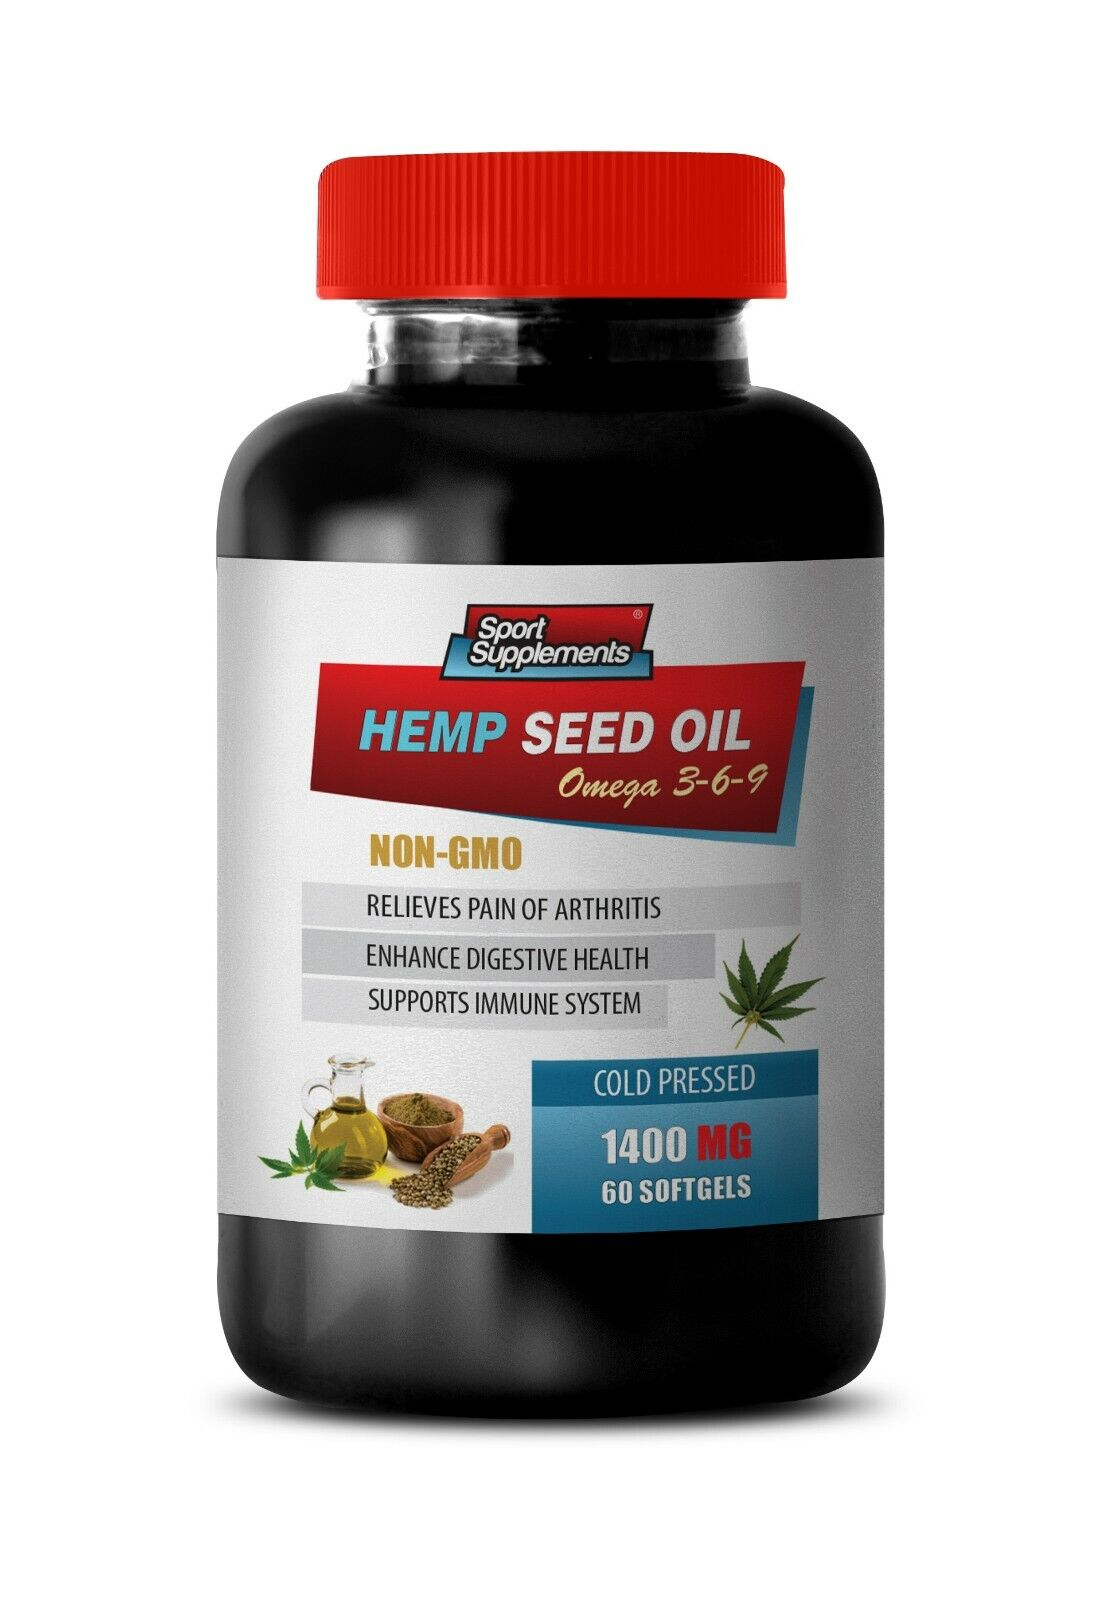 increase appetite - ORGANIC HEMP SEED OIL 1400mg (1) - general wellness oils